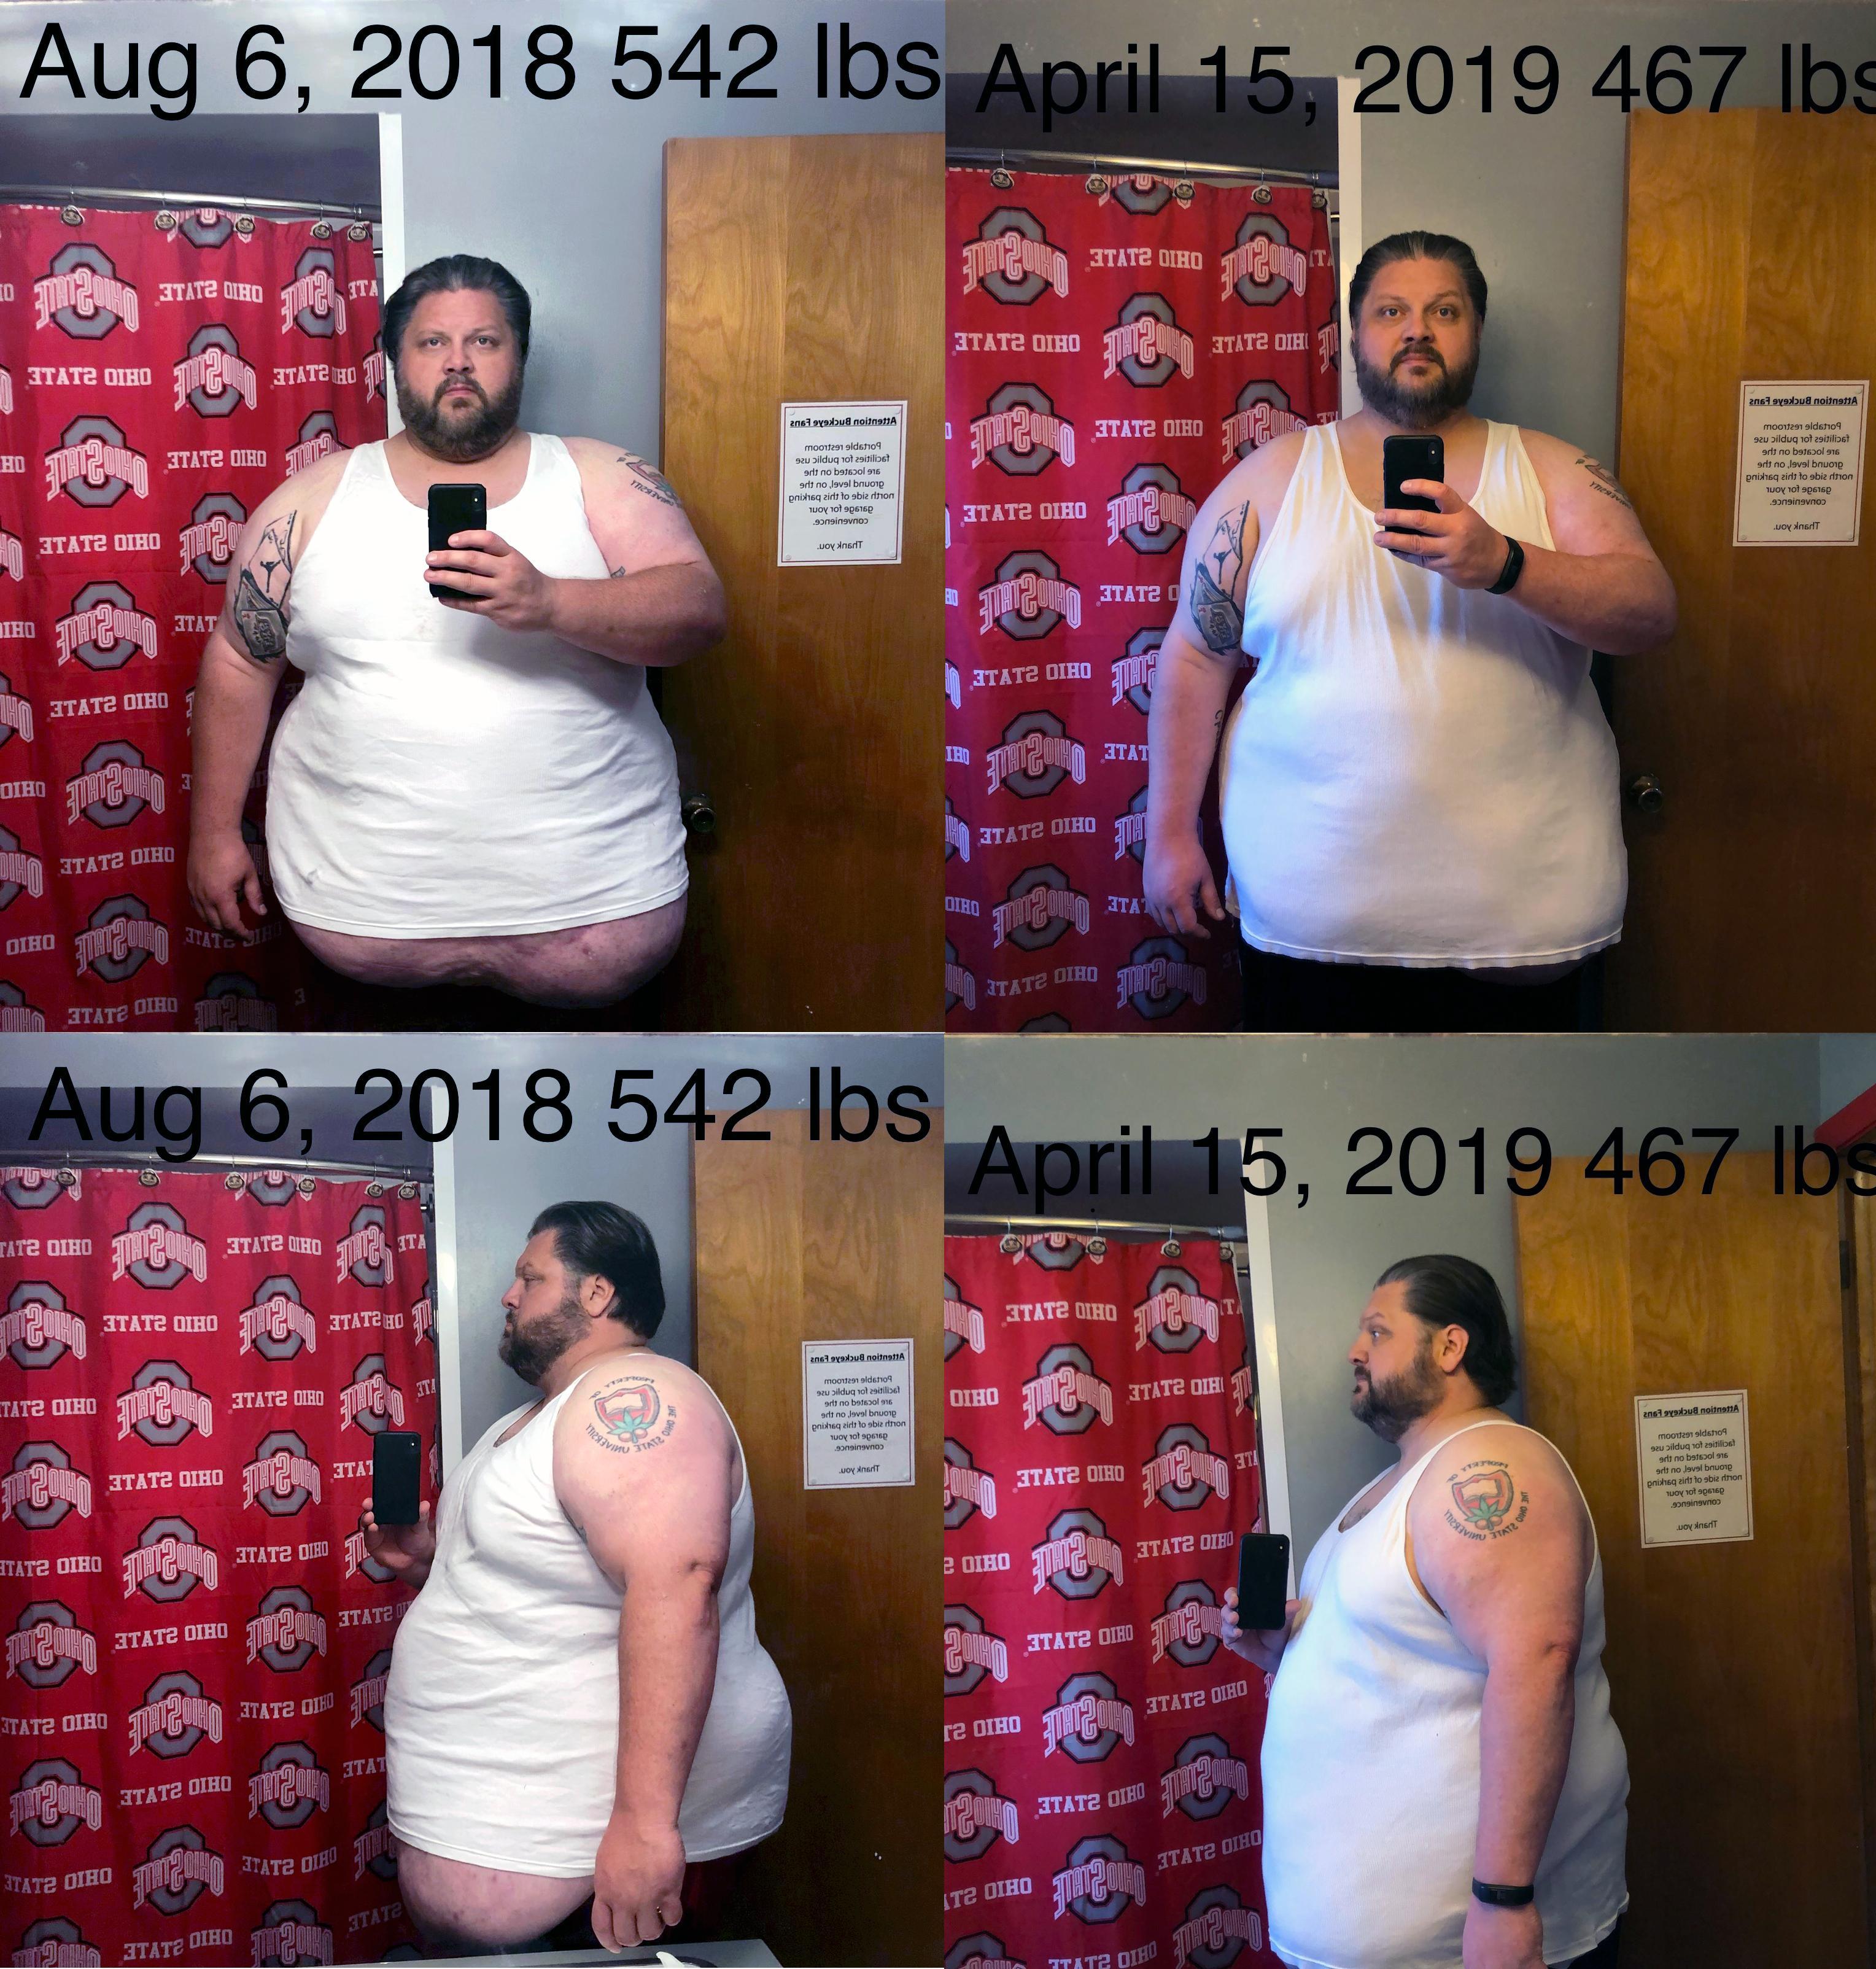 6'1 Male Progress Pics of 75 lbs Weight Loss 542 lbs to 467 lbs